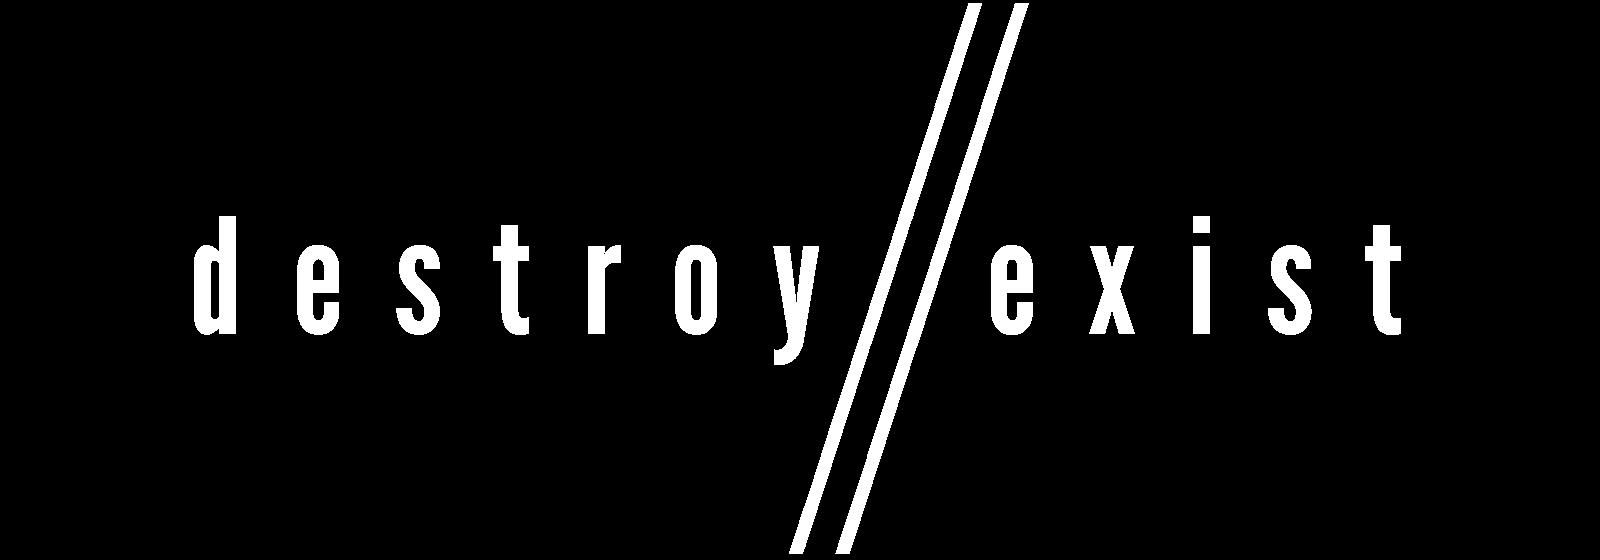 Destroy//Exist